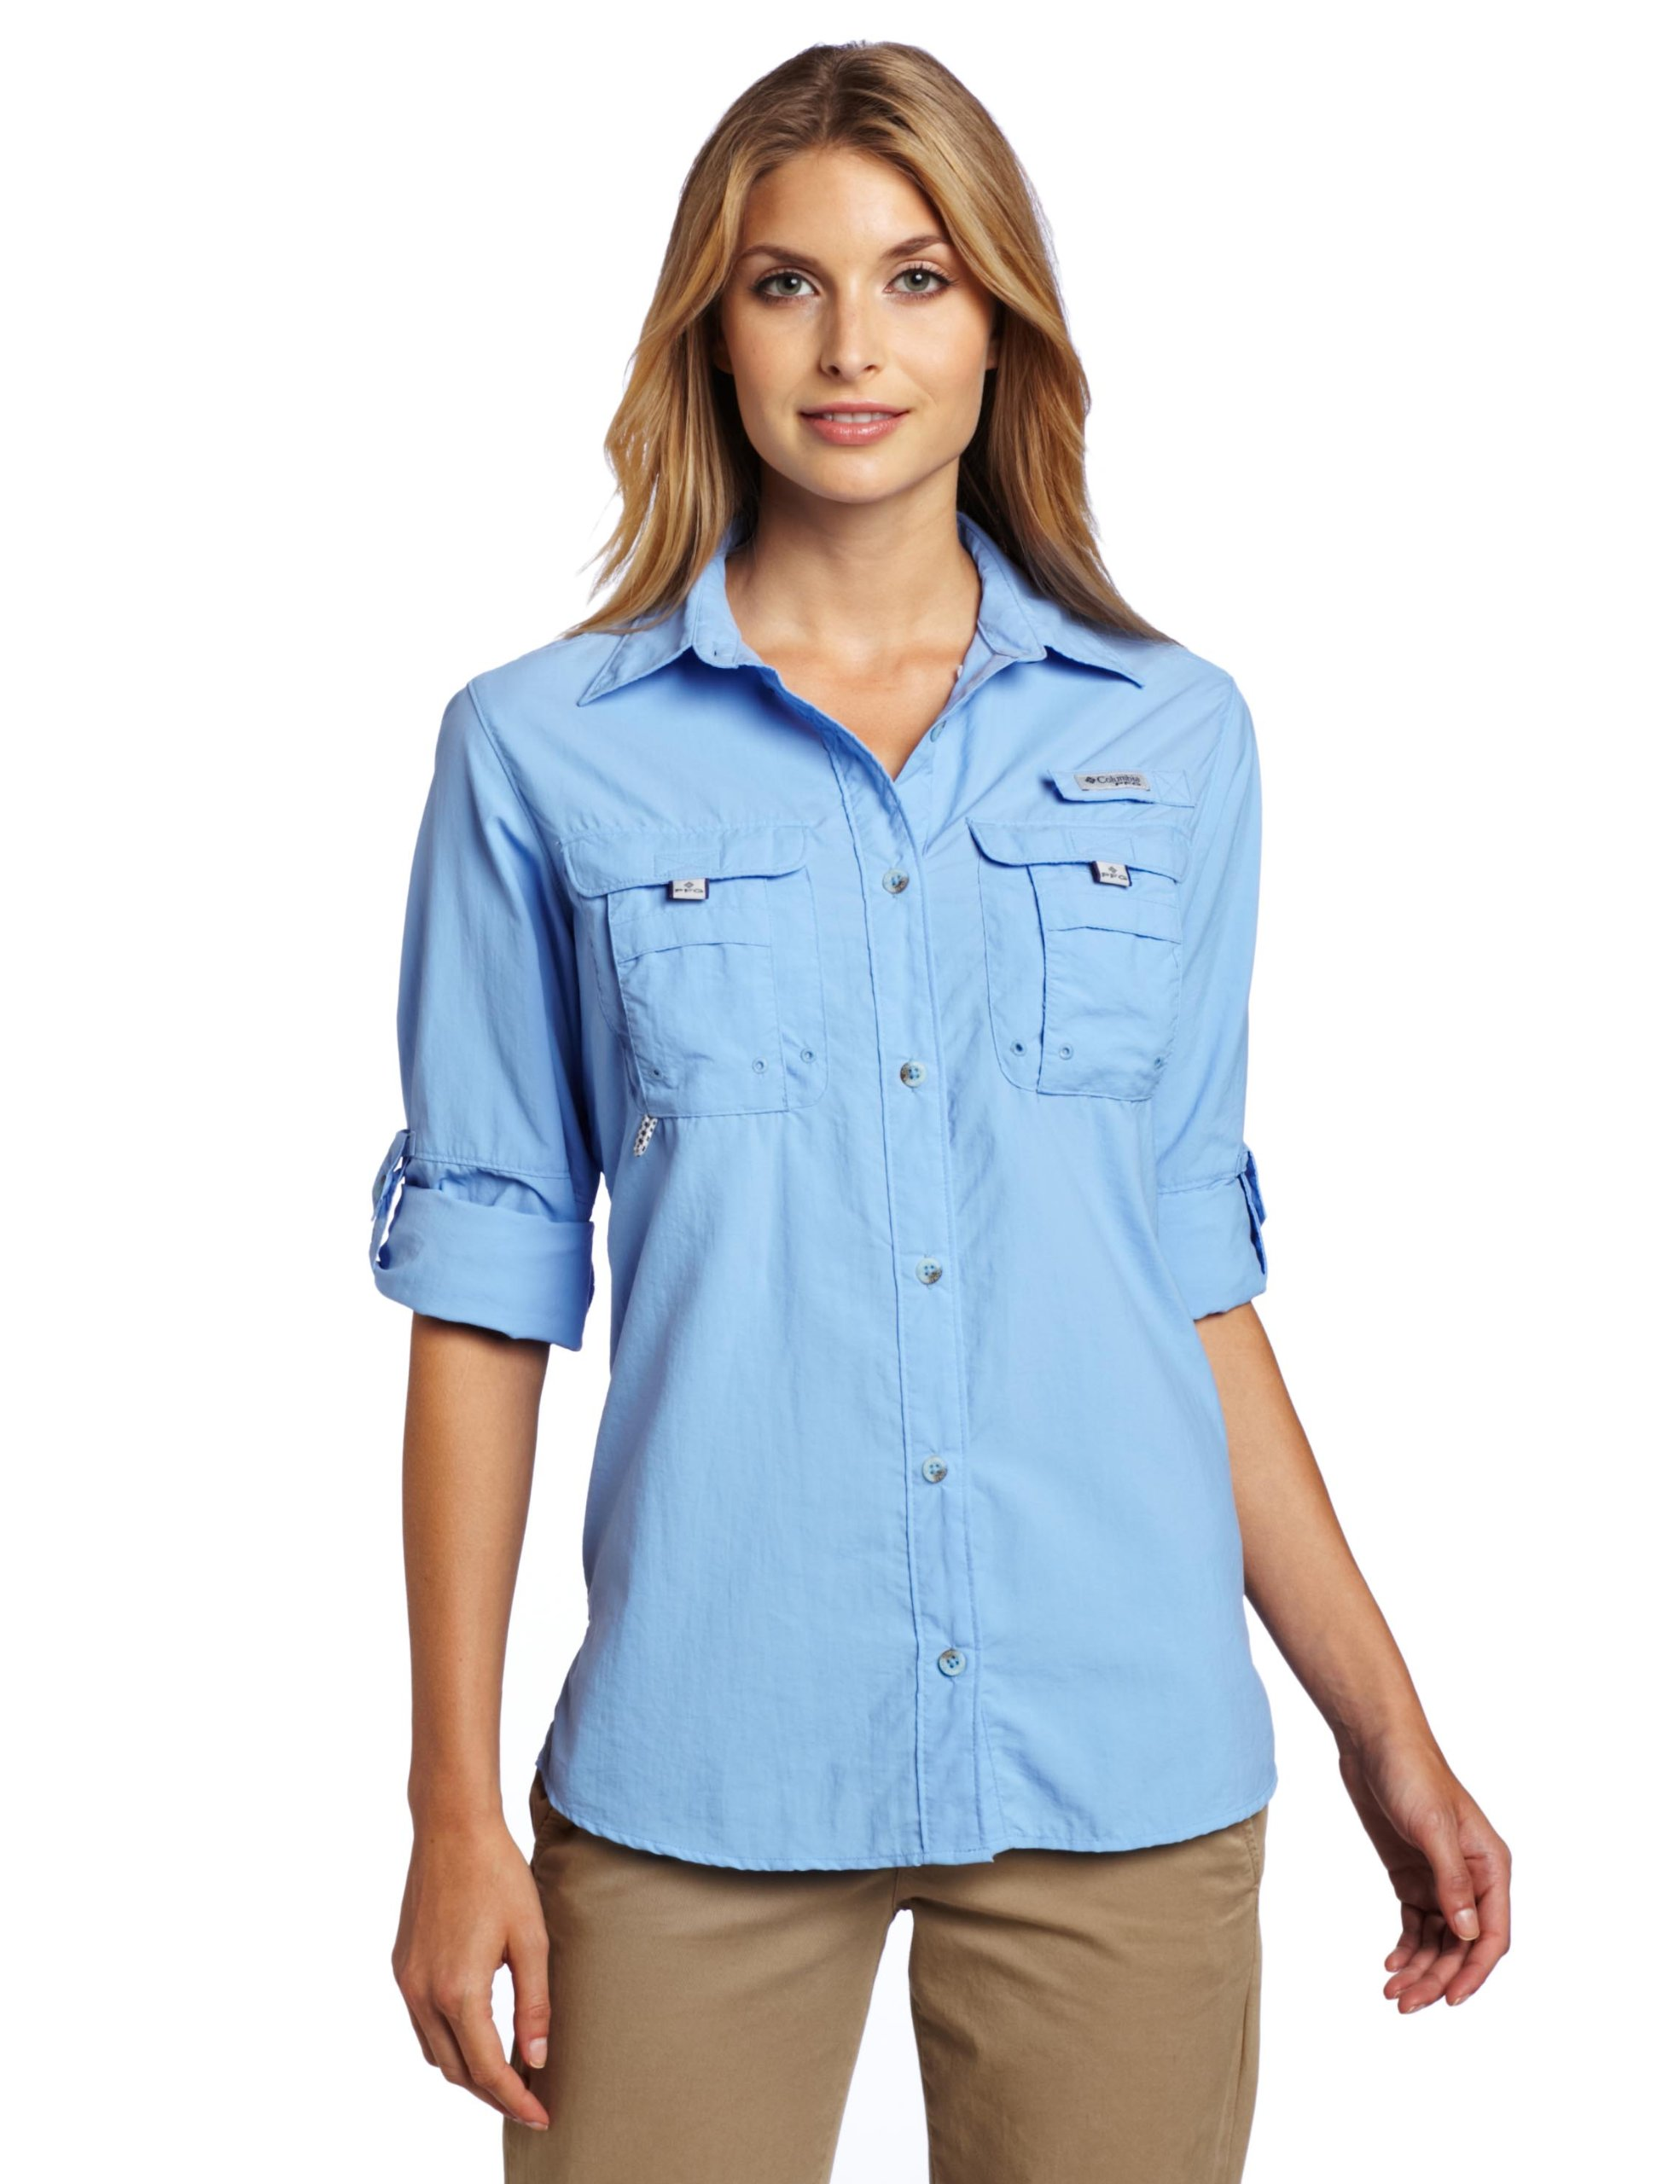 Galleon columbia women 39 s bahama long sleeve shirt for Toddler columbia fishing shirt